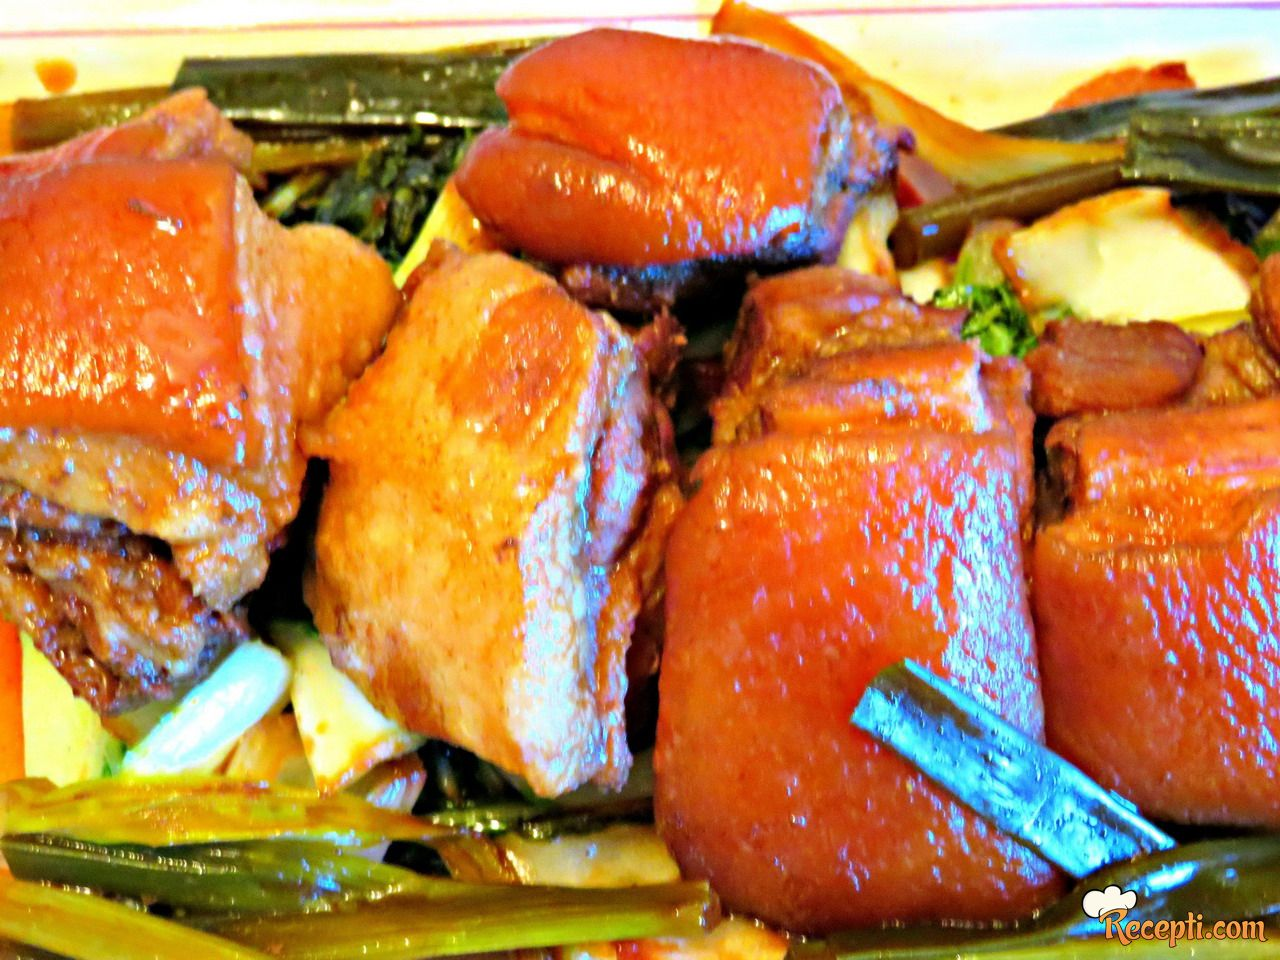 Dong Po Rou (Dinstana svinjska slanina)